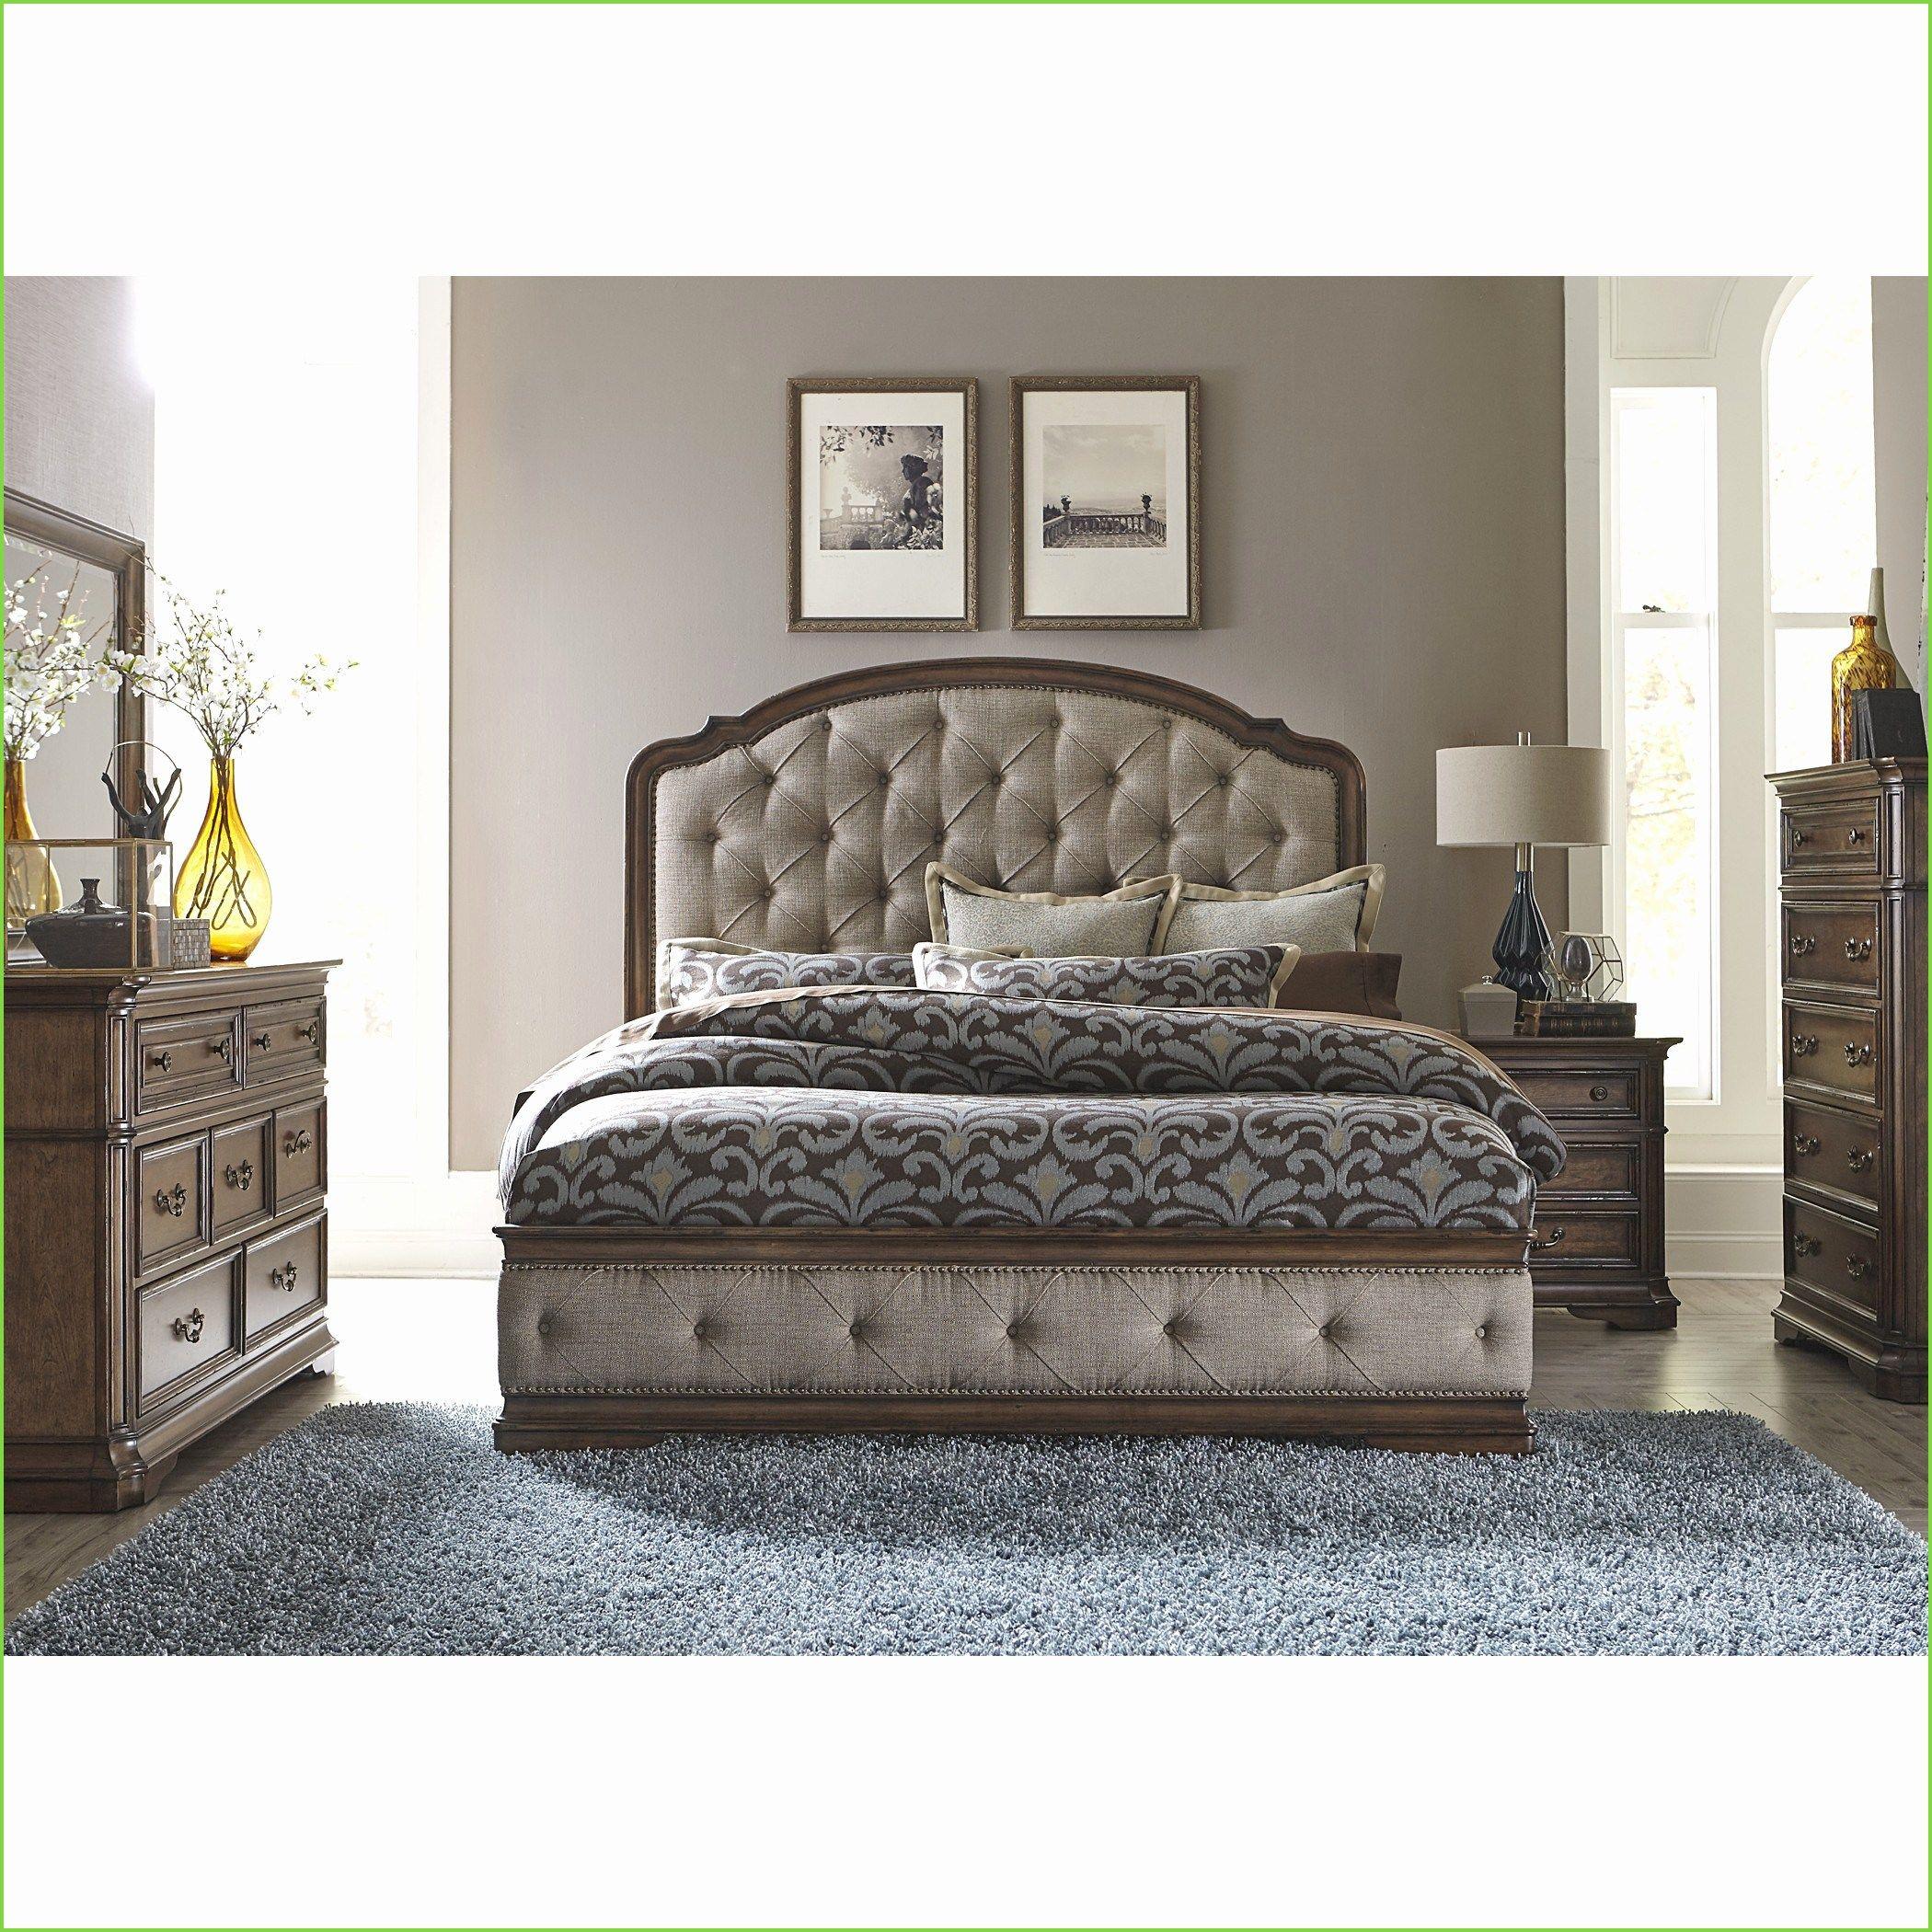 12 Clever Initiatives Of How To Build Rent A Center Bedroom Furniture Upholstered Bedroom Set Liberty Furniture Bedroom Set